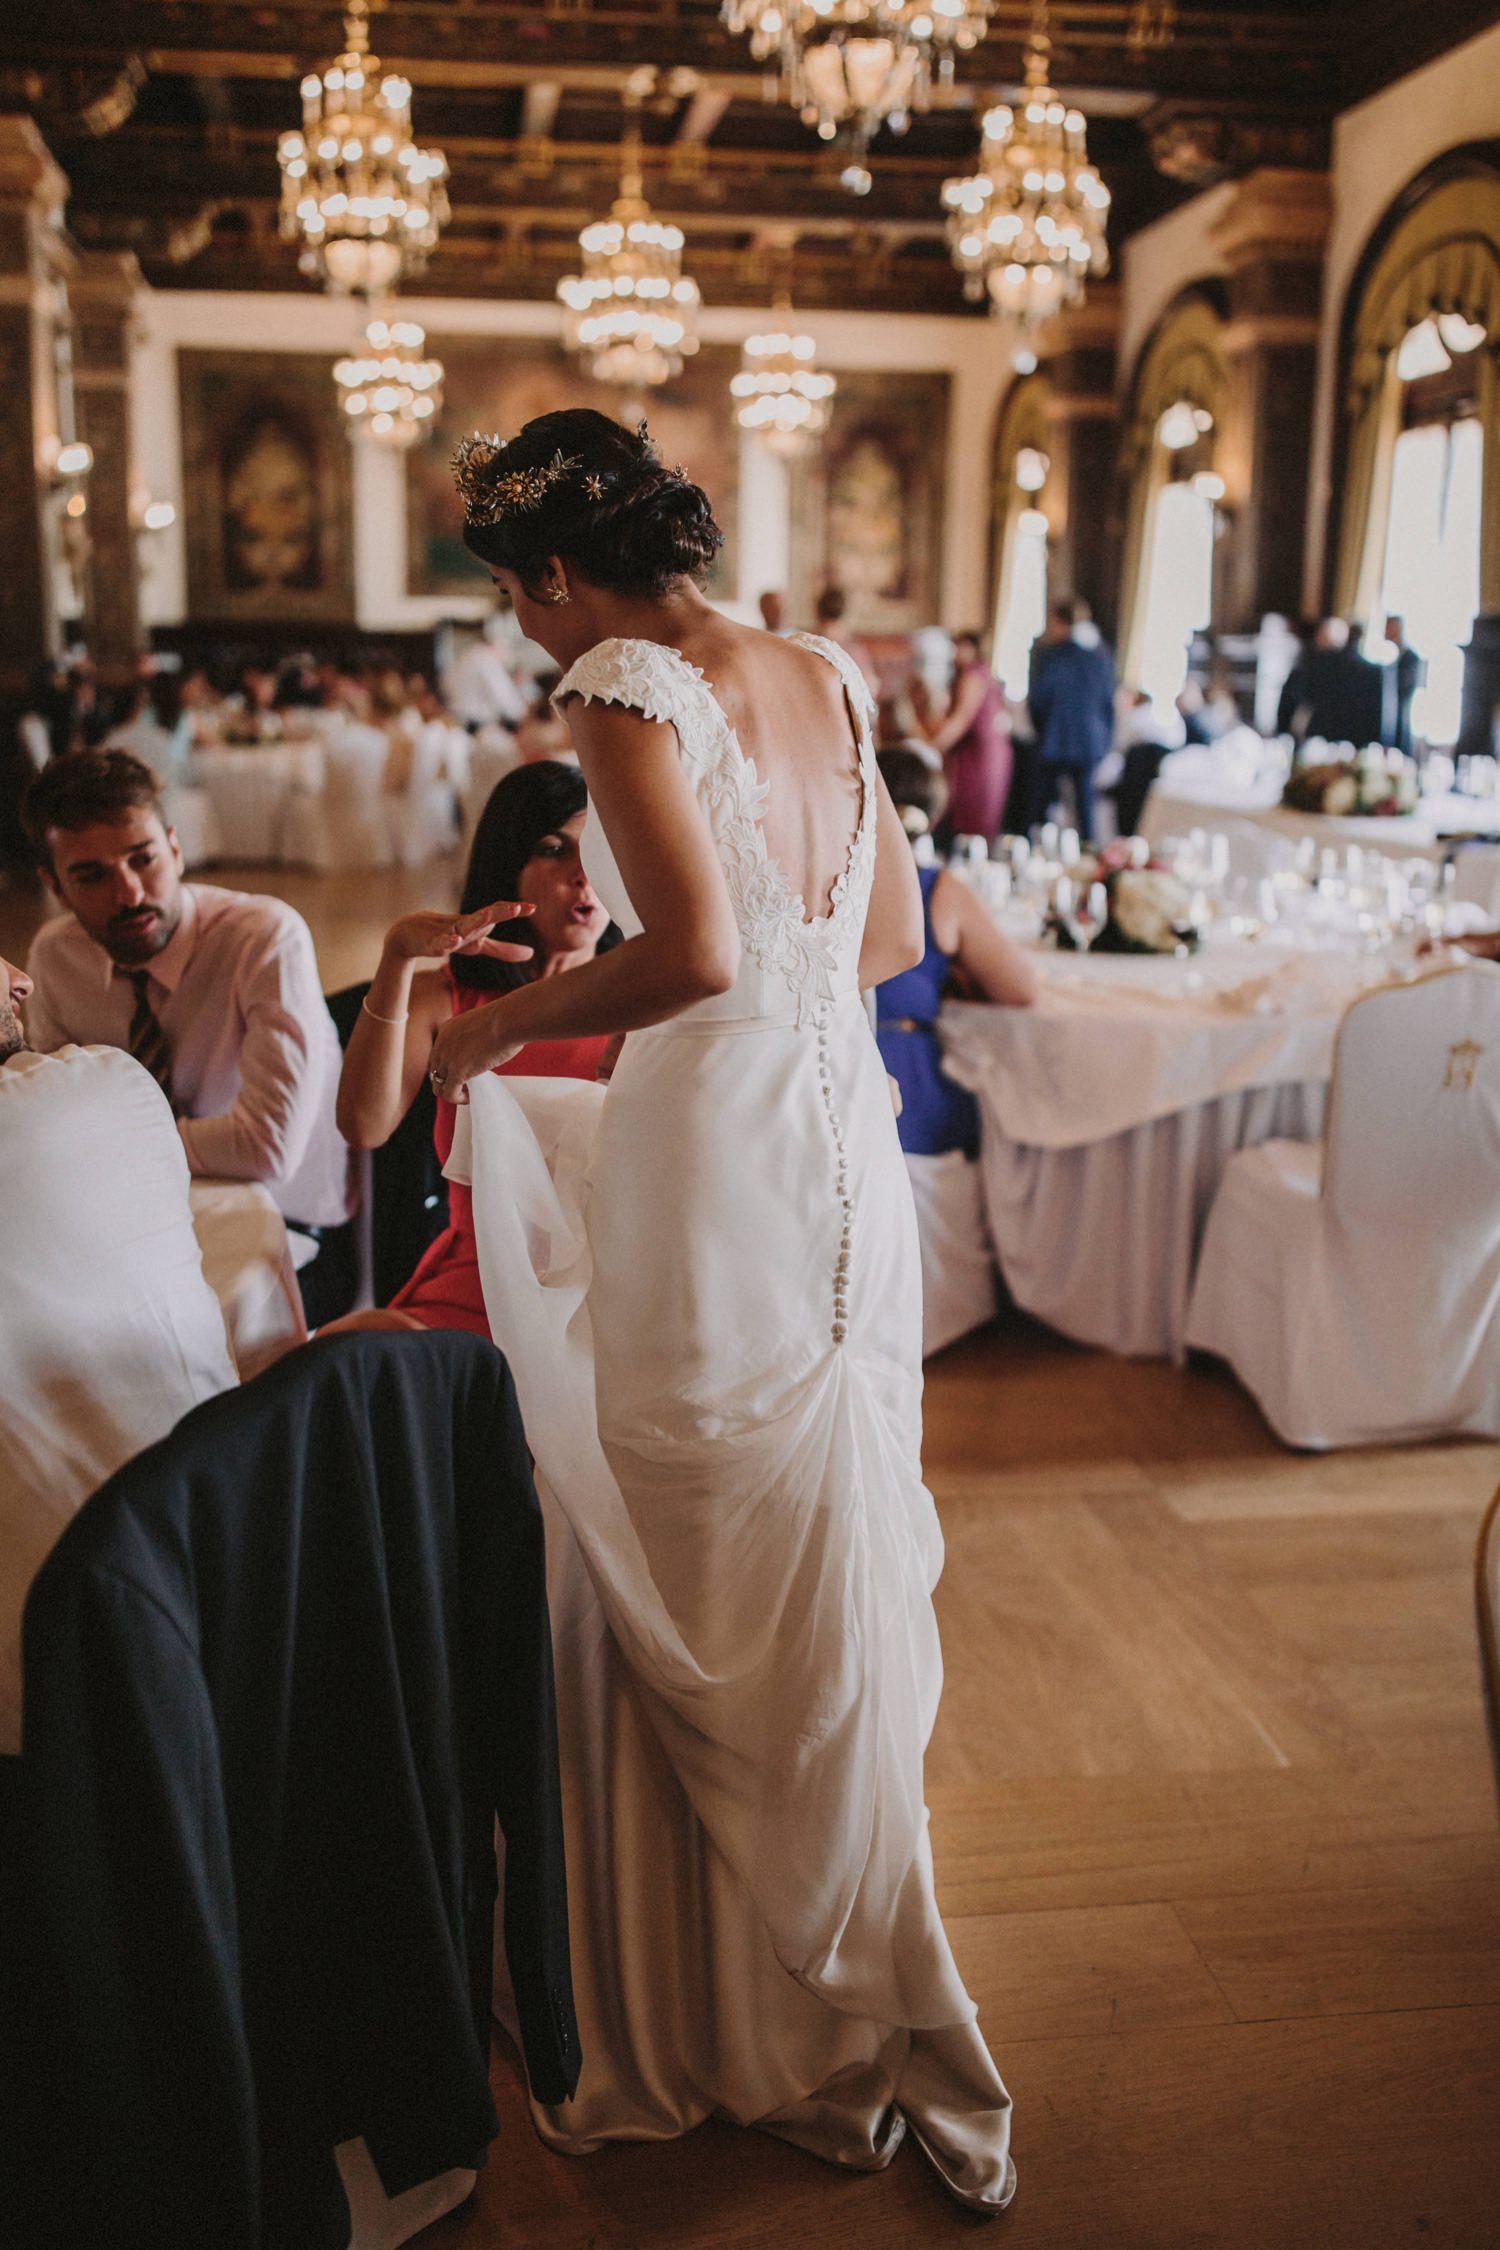 084_wedding-ernestovillalba-maria-daniel-5286-ASE.jpg